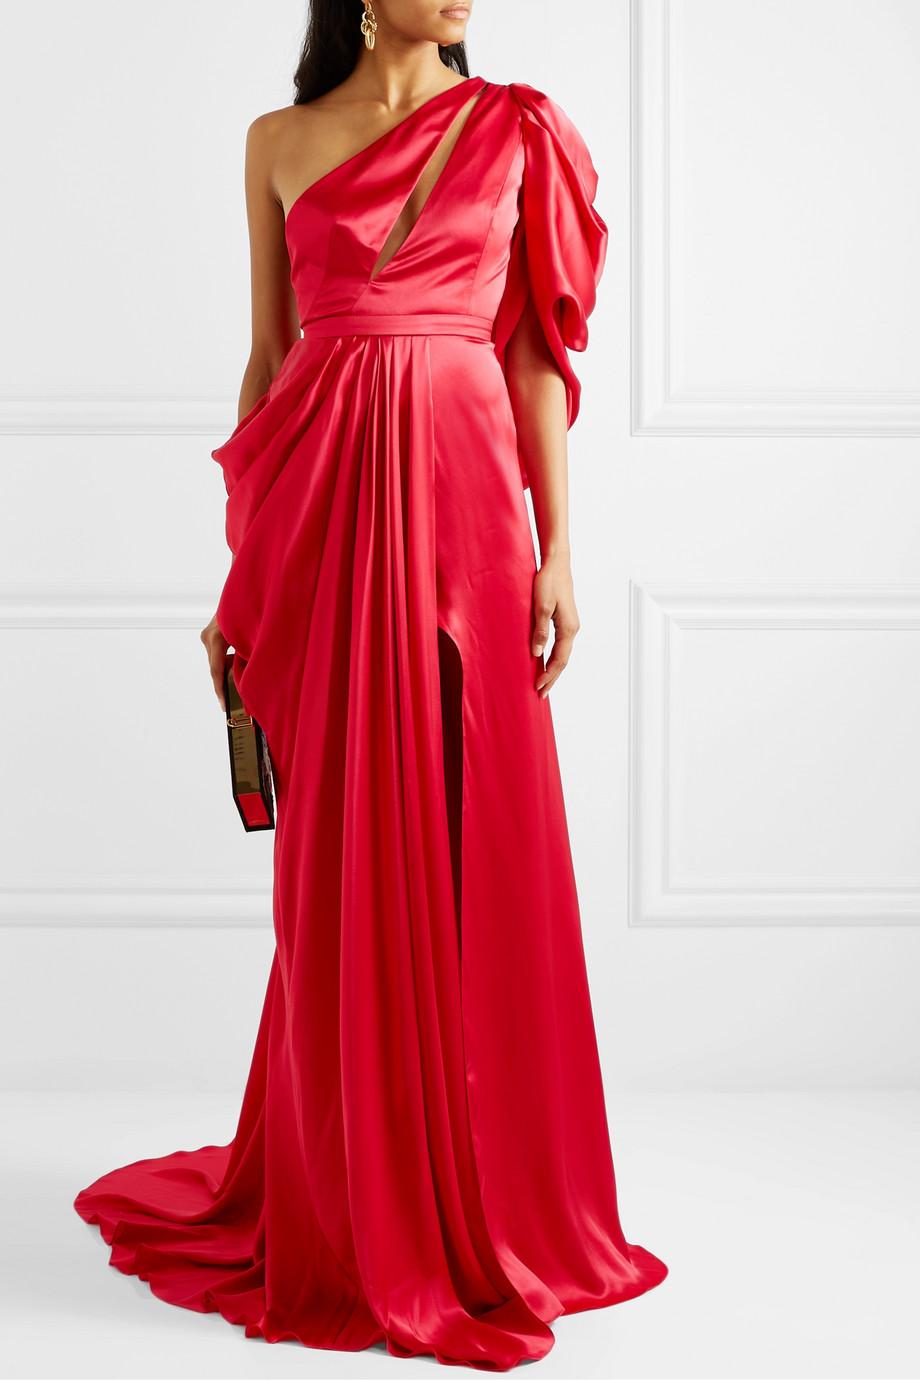 Ong-Oaj Pairam Evelyn one-shoulder draped silk-satin gown